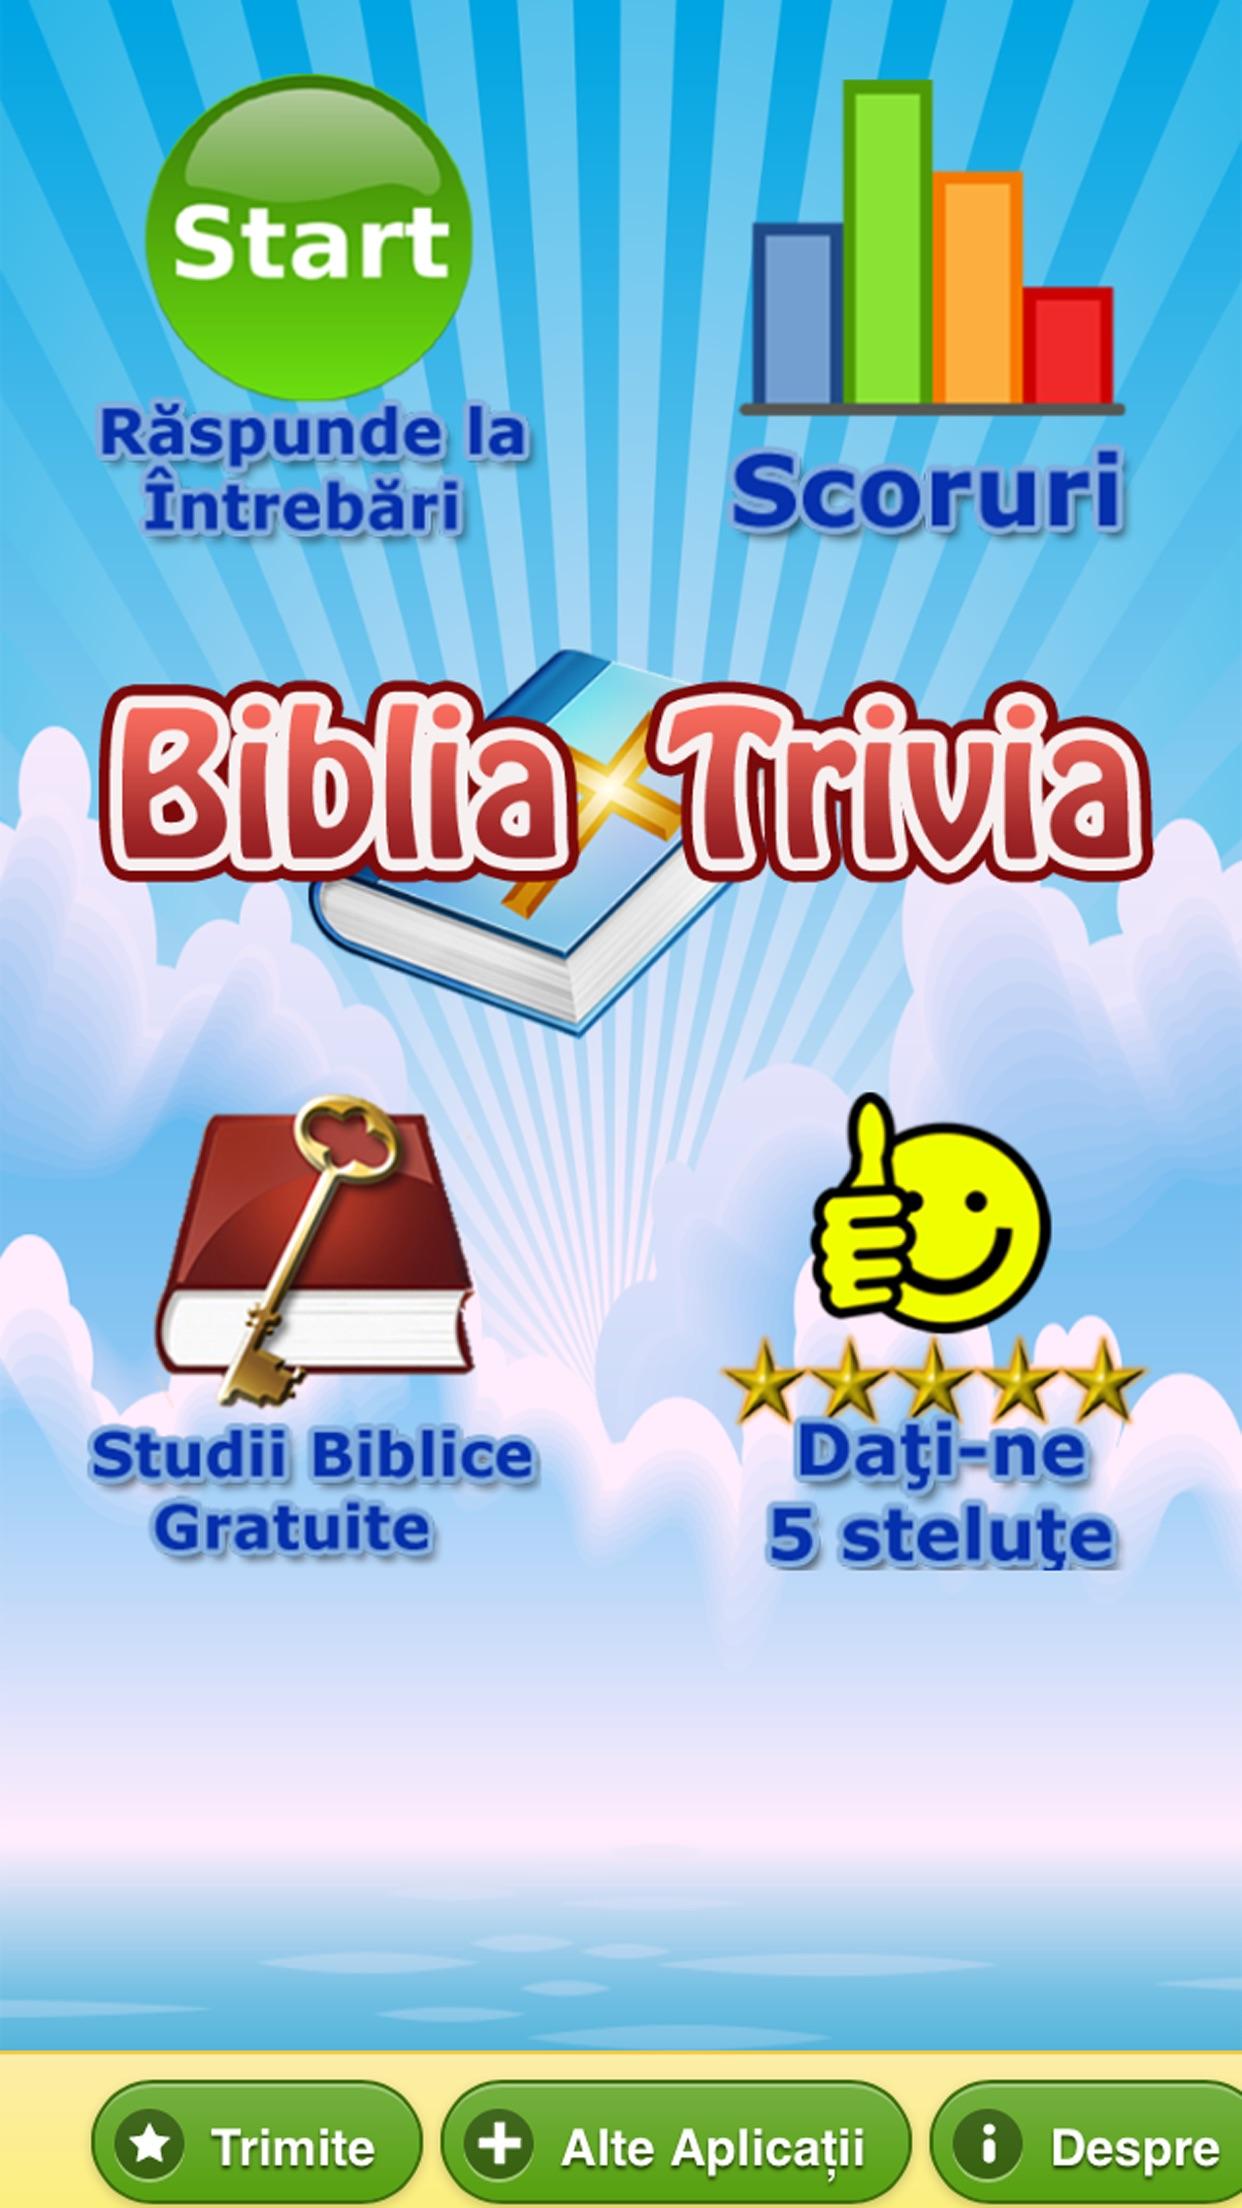 Chestionar Biblic Crestin - Studiu Biblic Screenshot